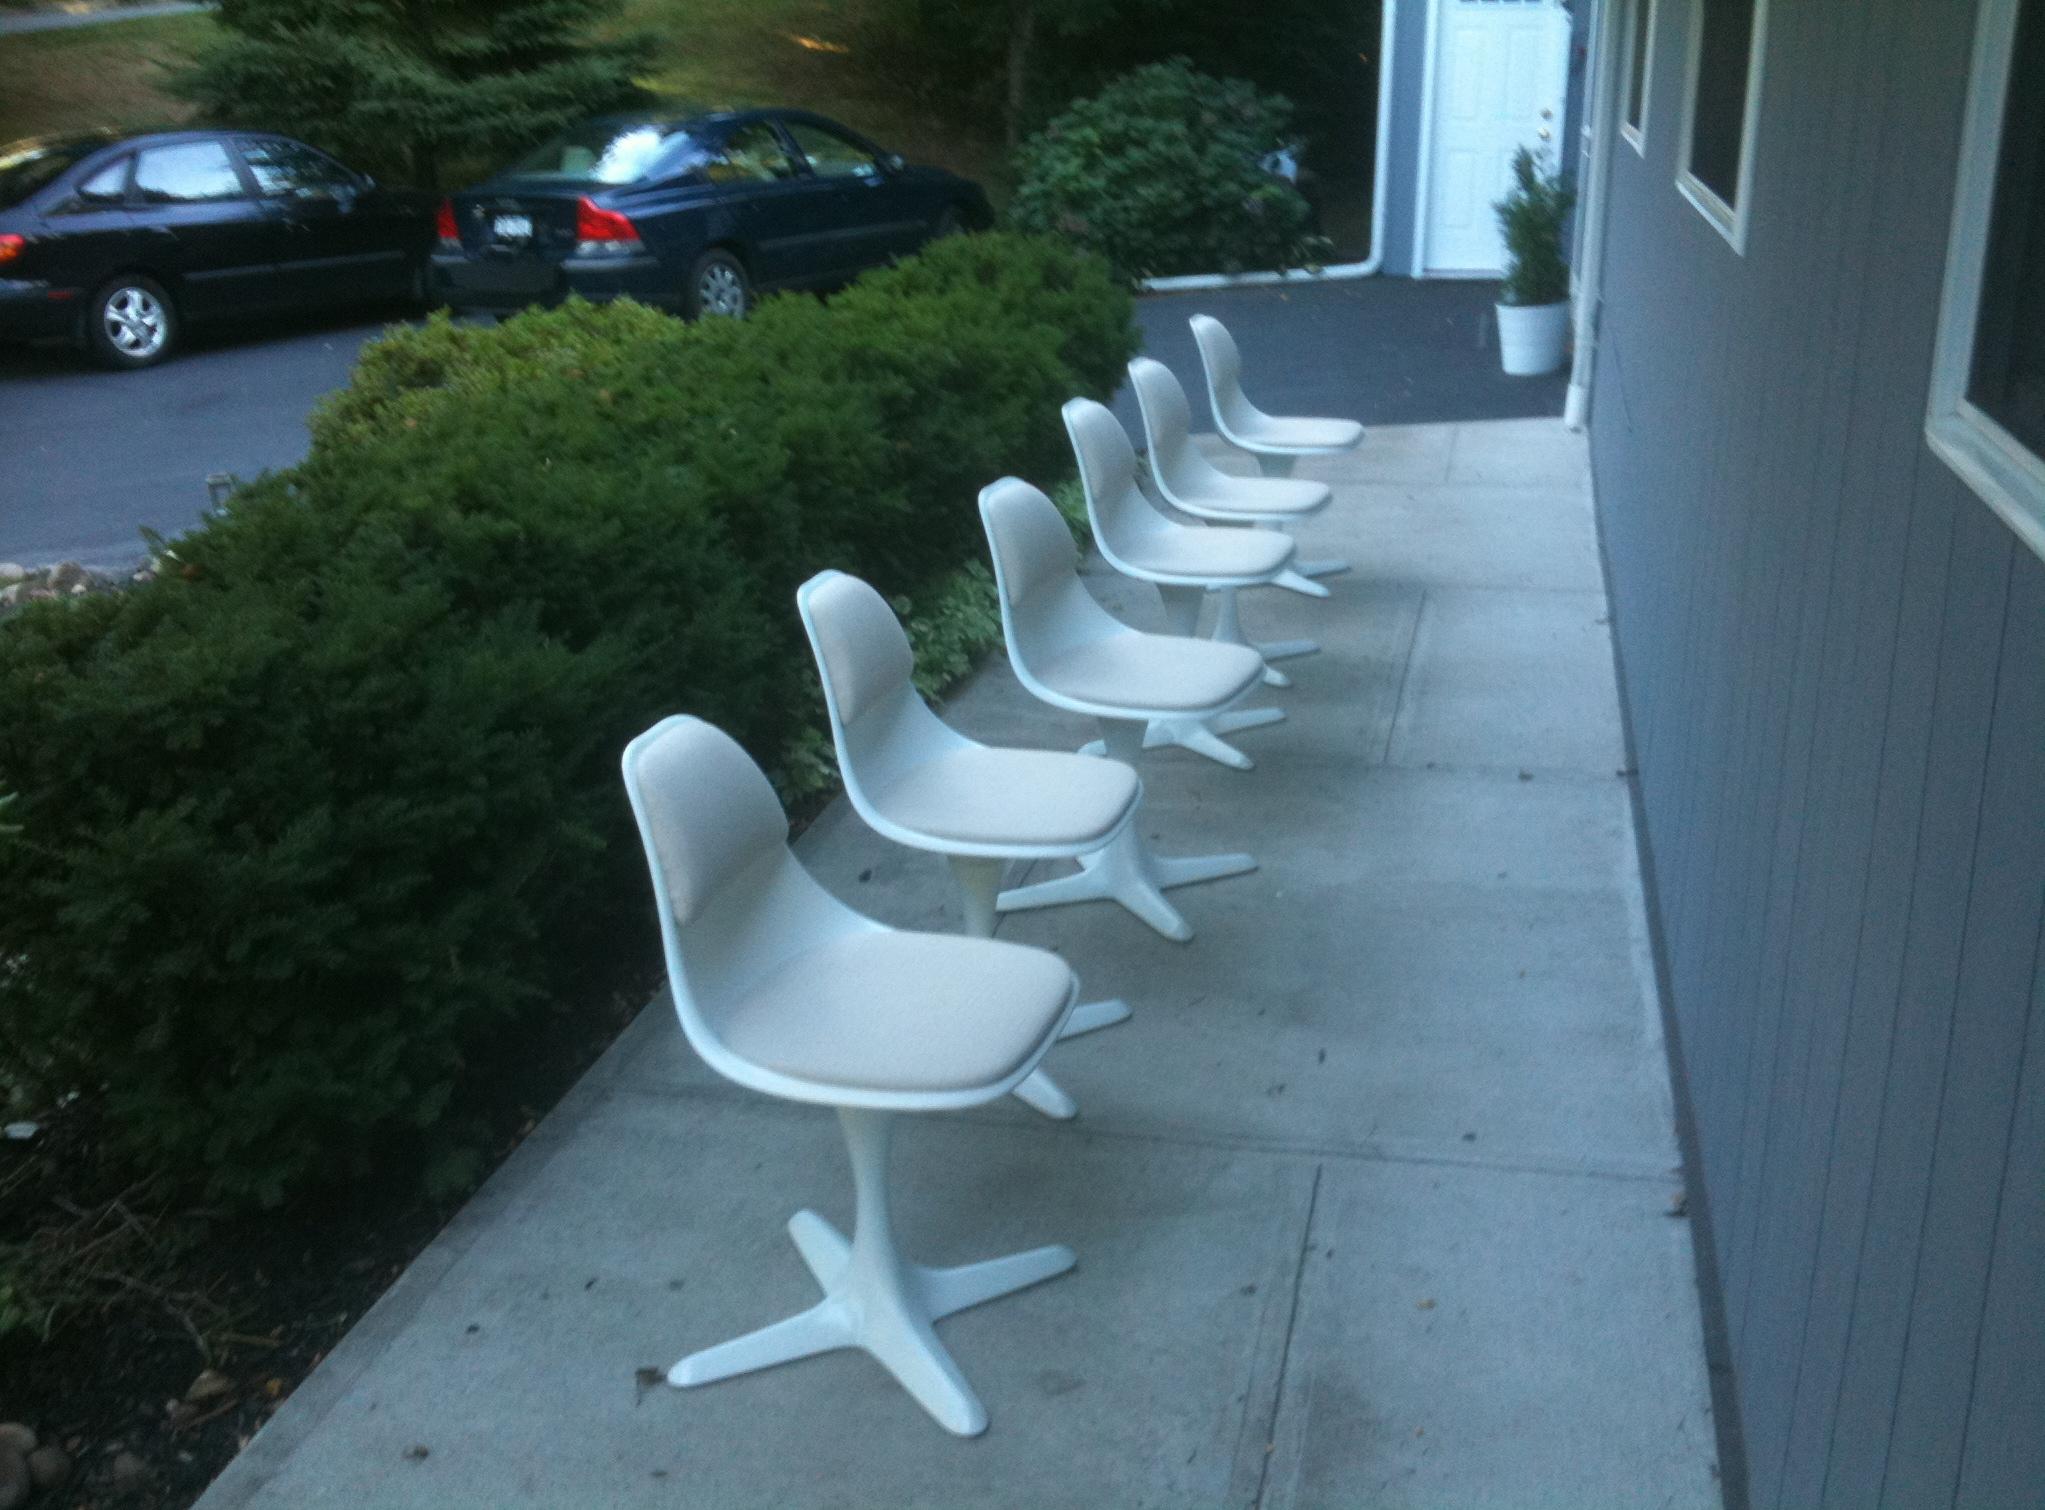 Burke Inc Chairs Four Star Base On Walkway